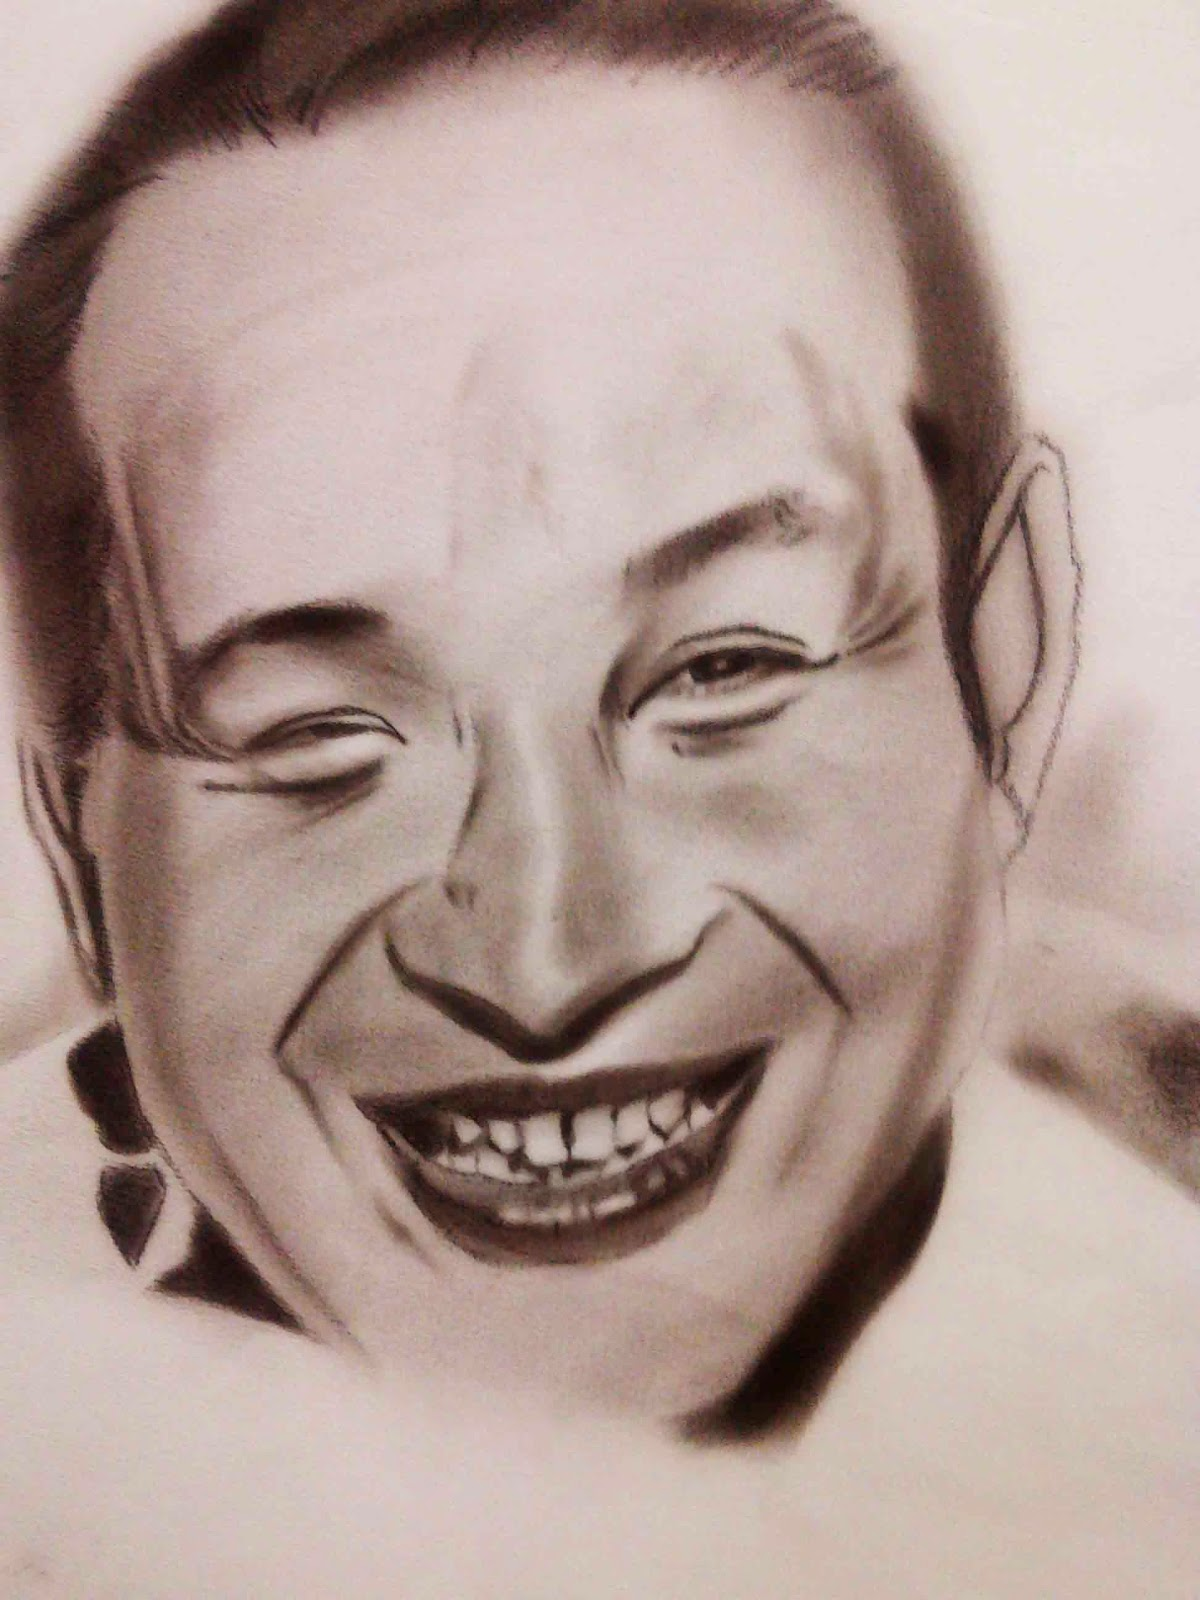 Lukis Wajahku Dong Pekanbaru ART